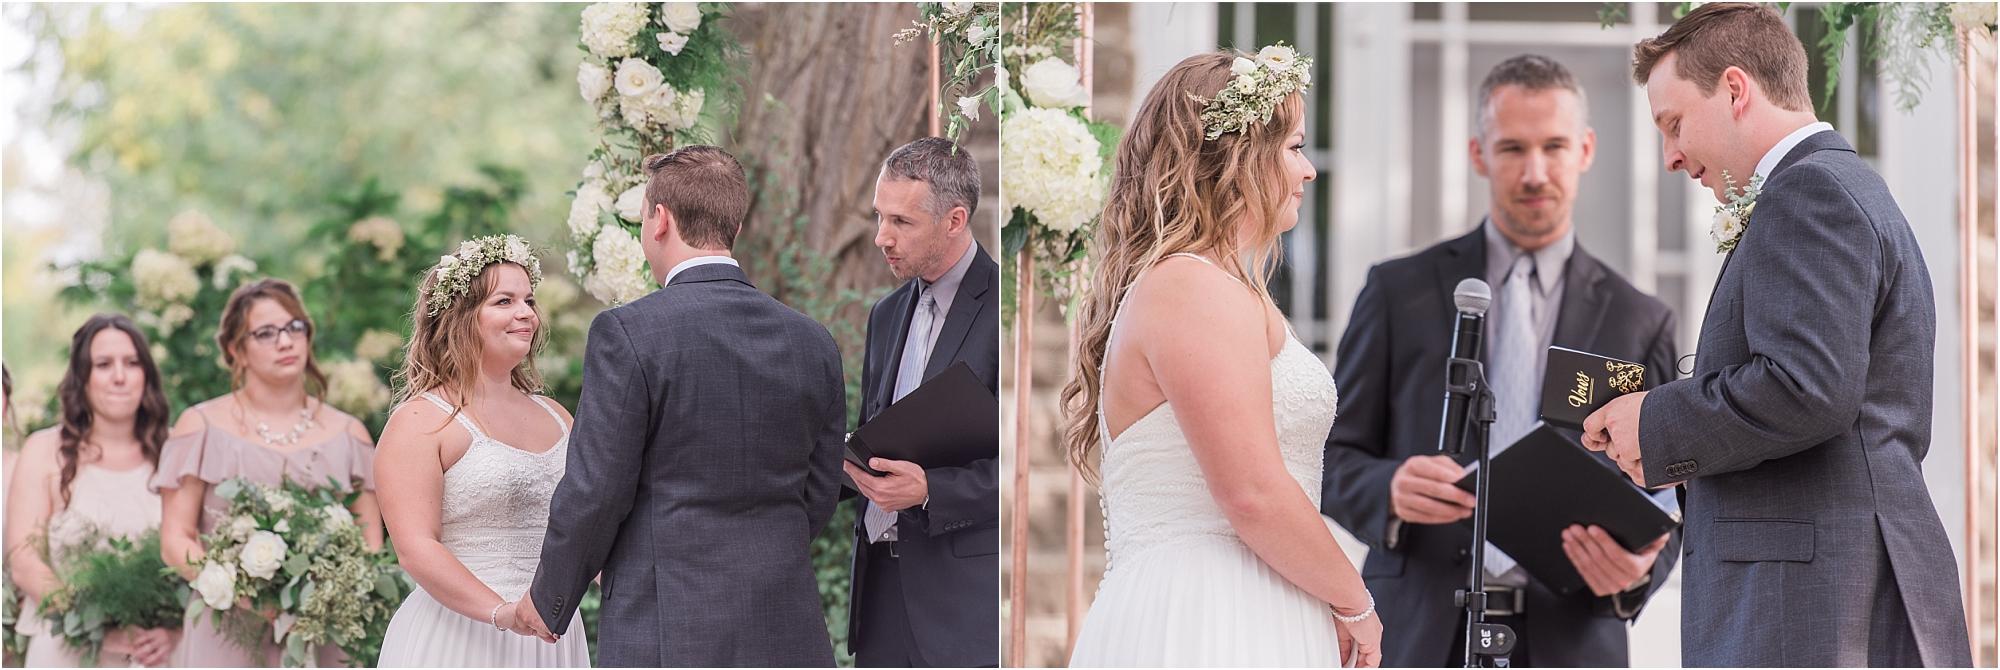 0071 Summer Stonefields Wedding Carleton Place - Ottawa Wedding - Photography by Emma_WEB.jpg